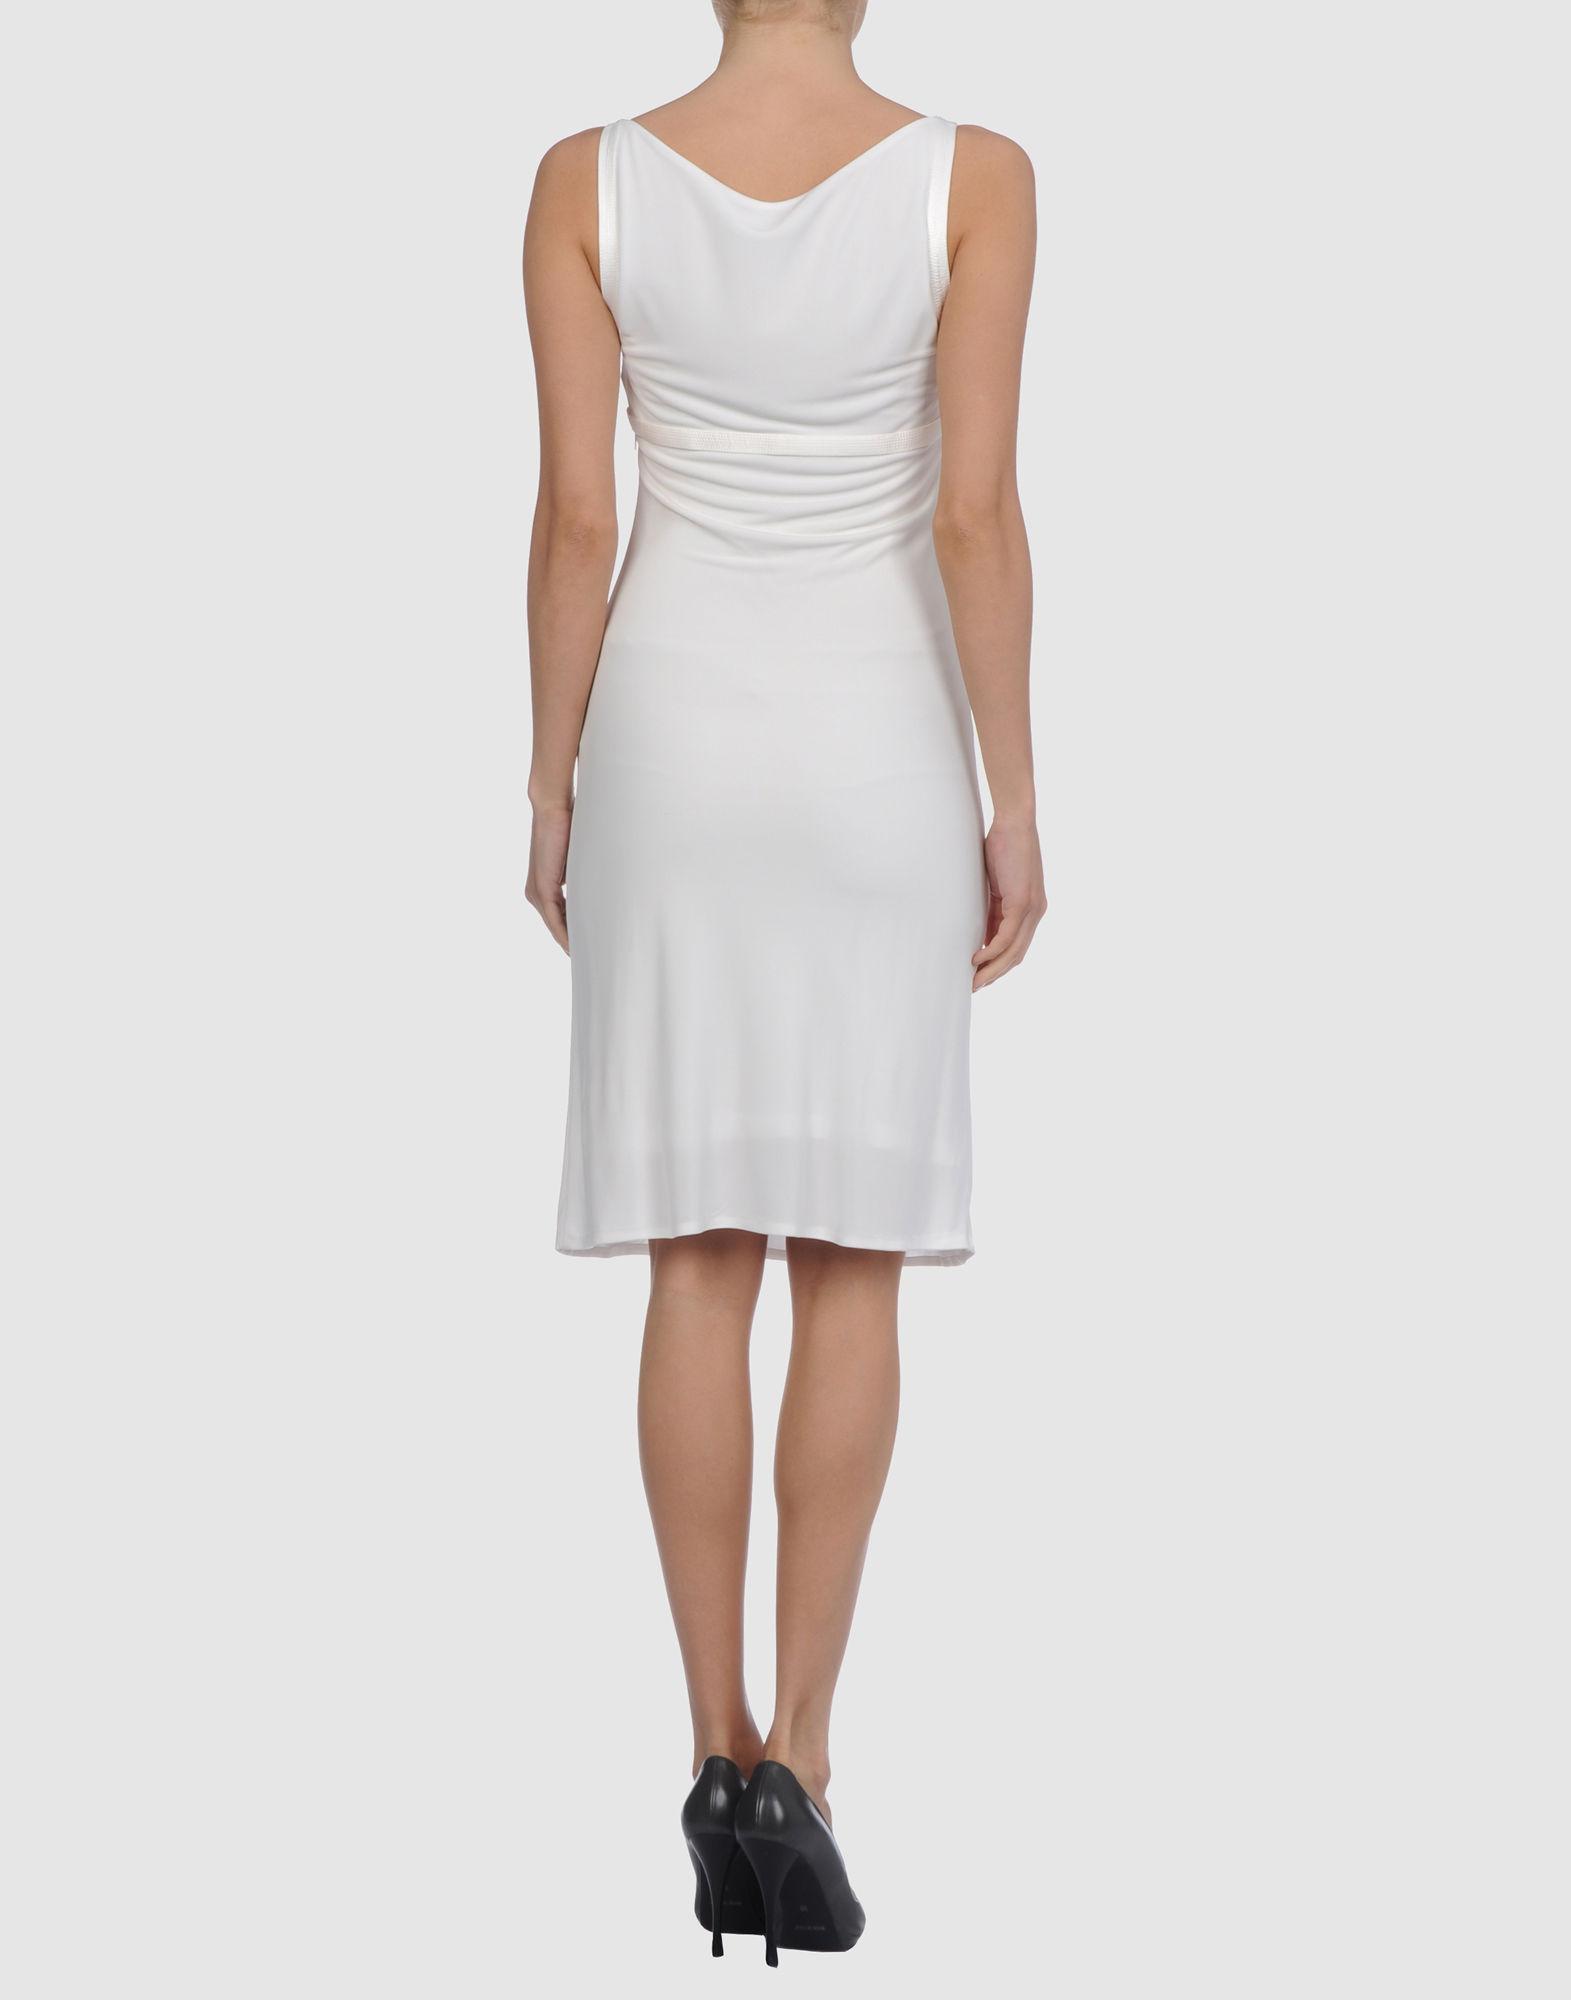 34215446FF 14 r - Evening Φορεματα Versace 2011 2012 Κωδ.27